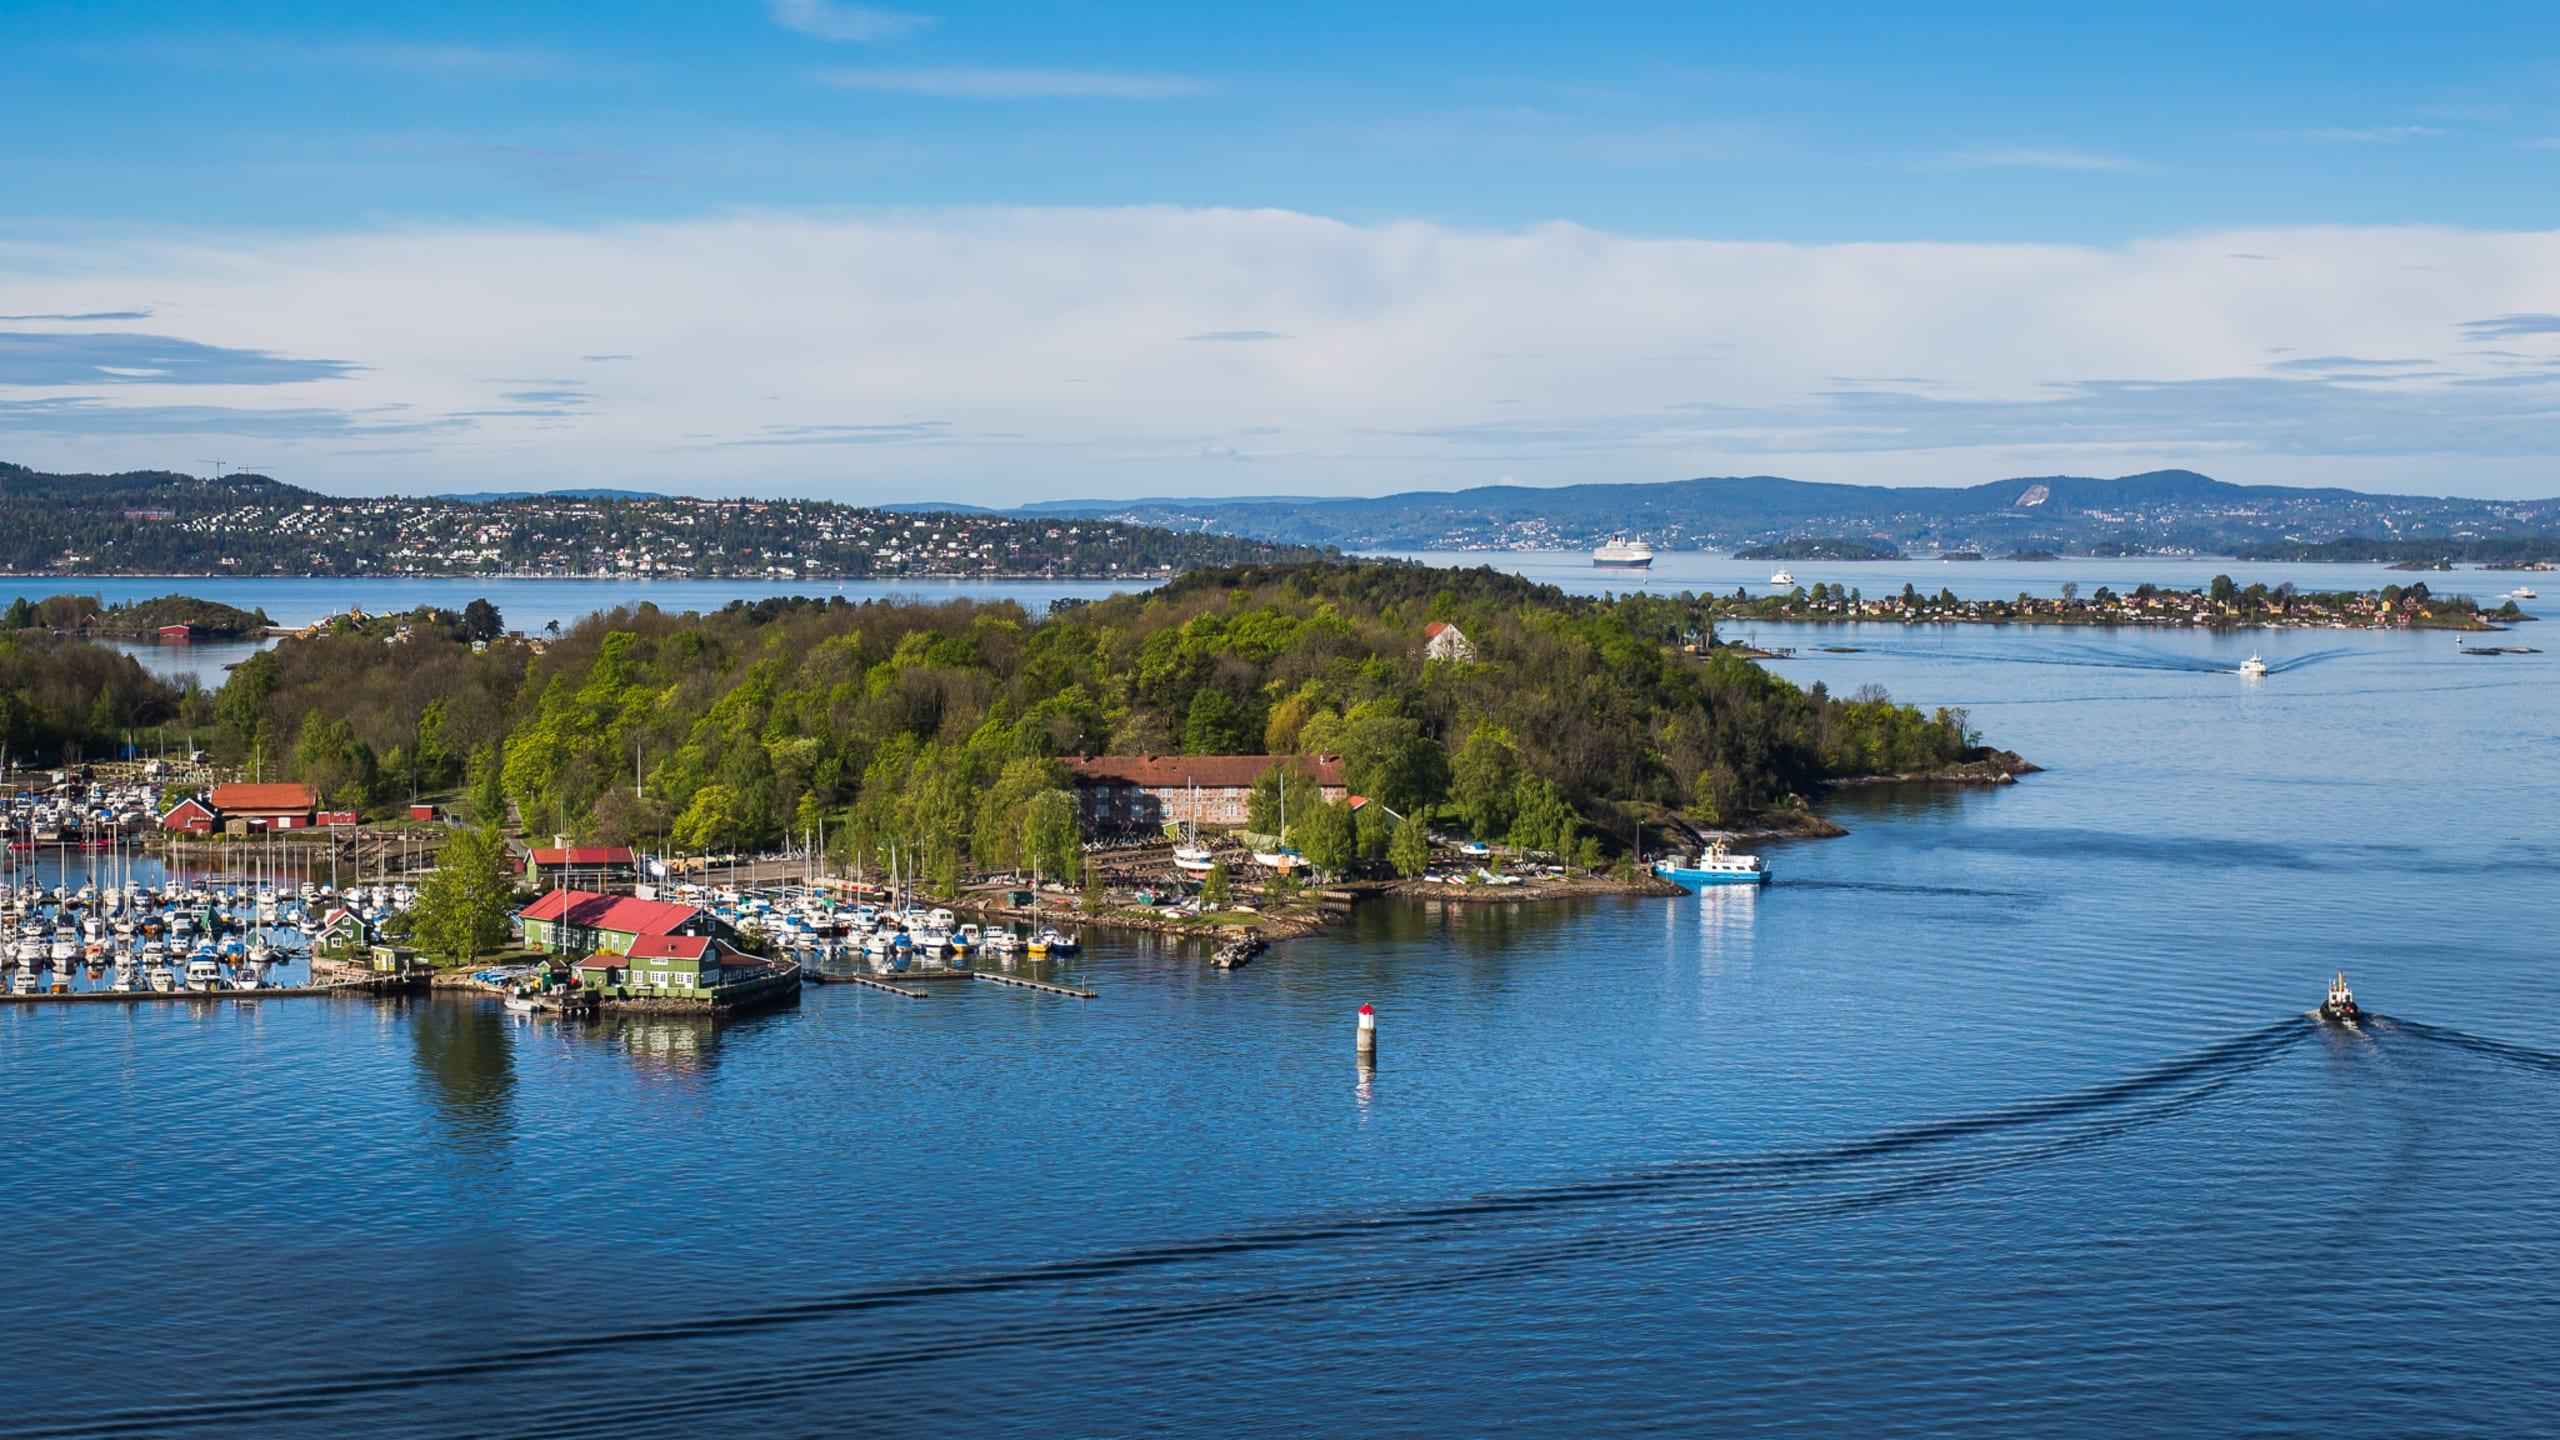 Islands in the Oslofjord